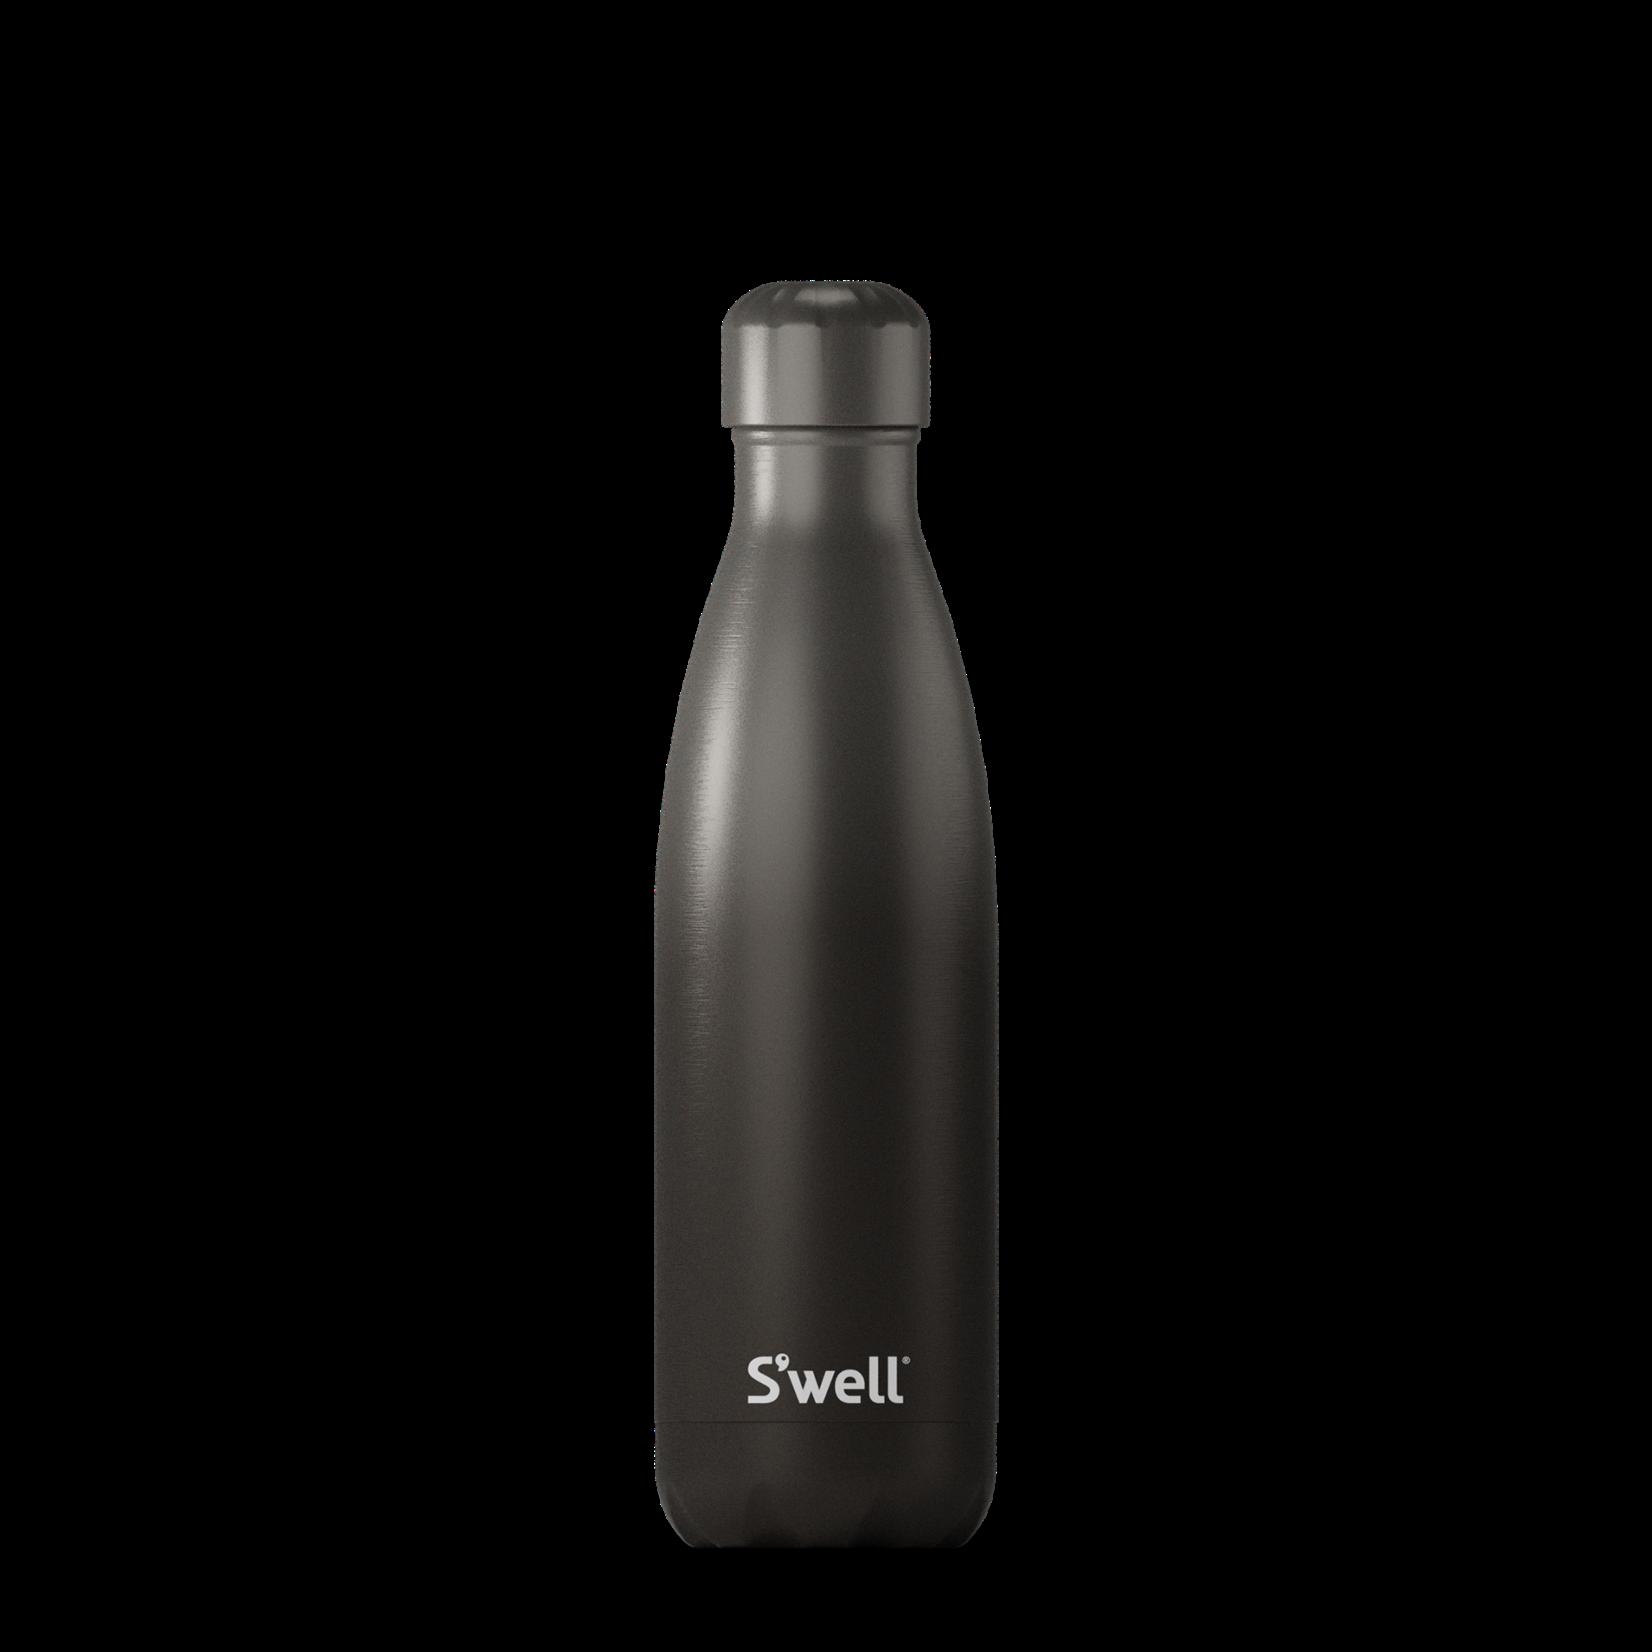 Swell Gleam Bottle 17oz.